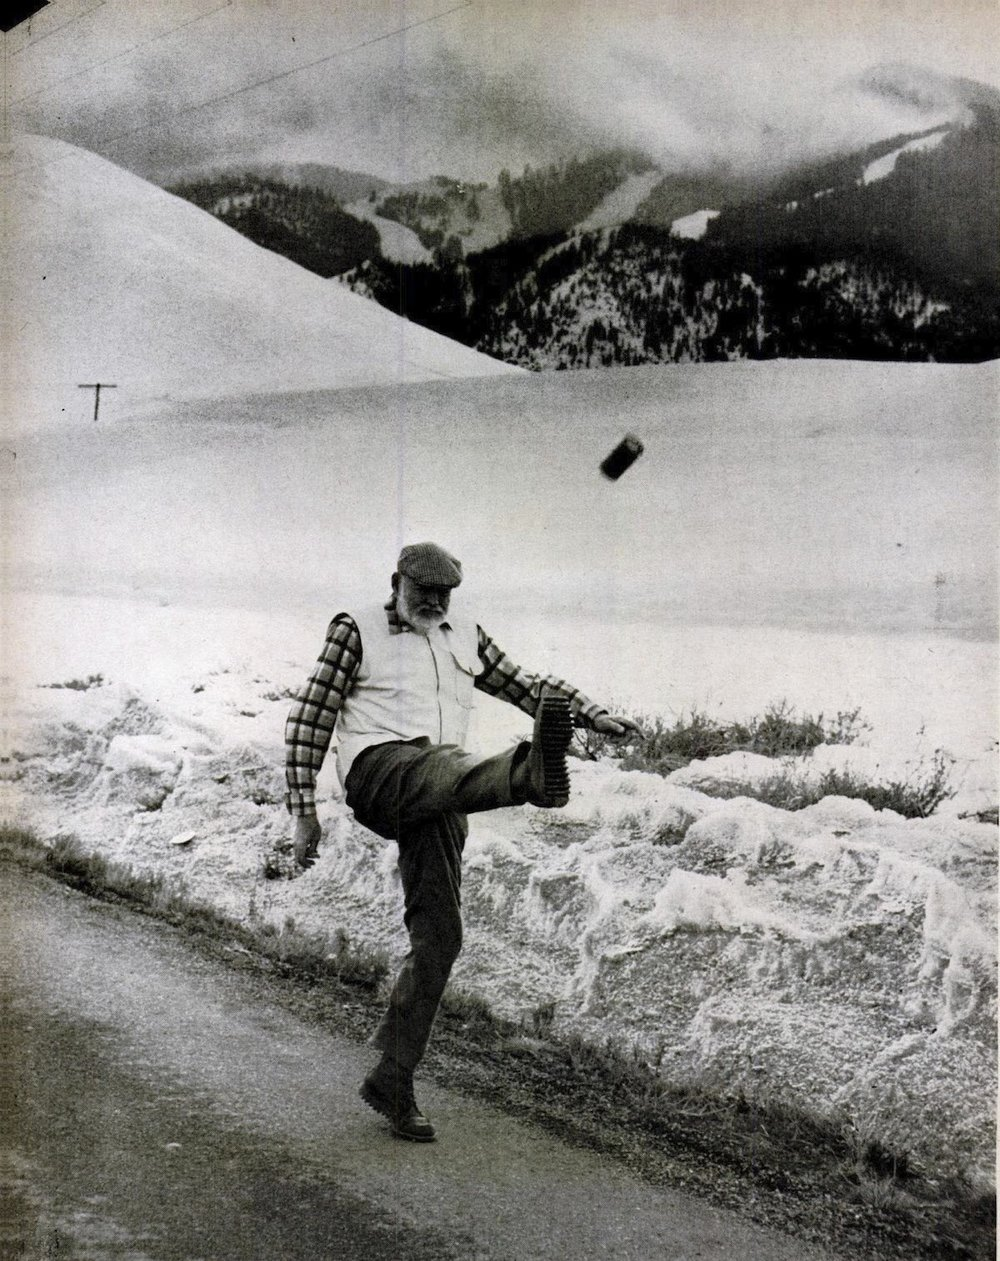 Hemingway knows what's up.   (via Kottke)